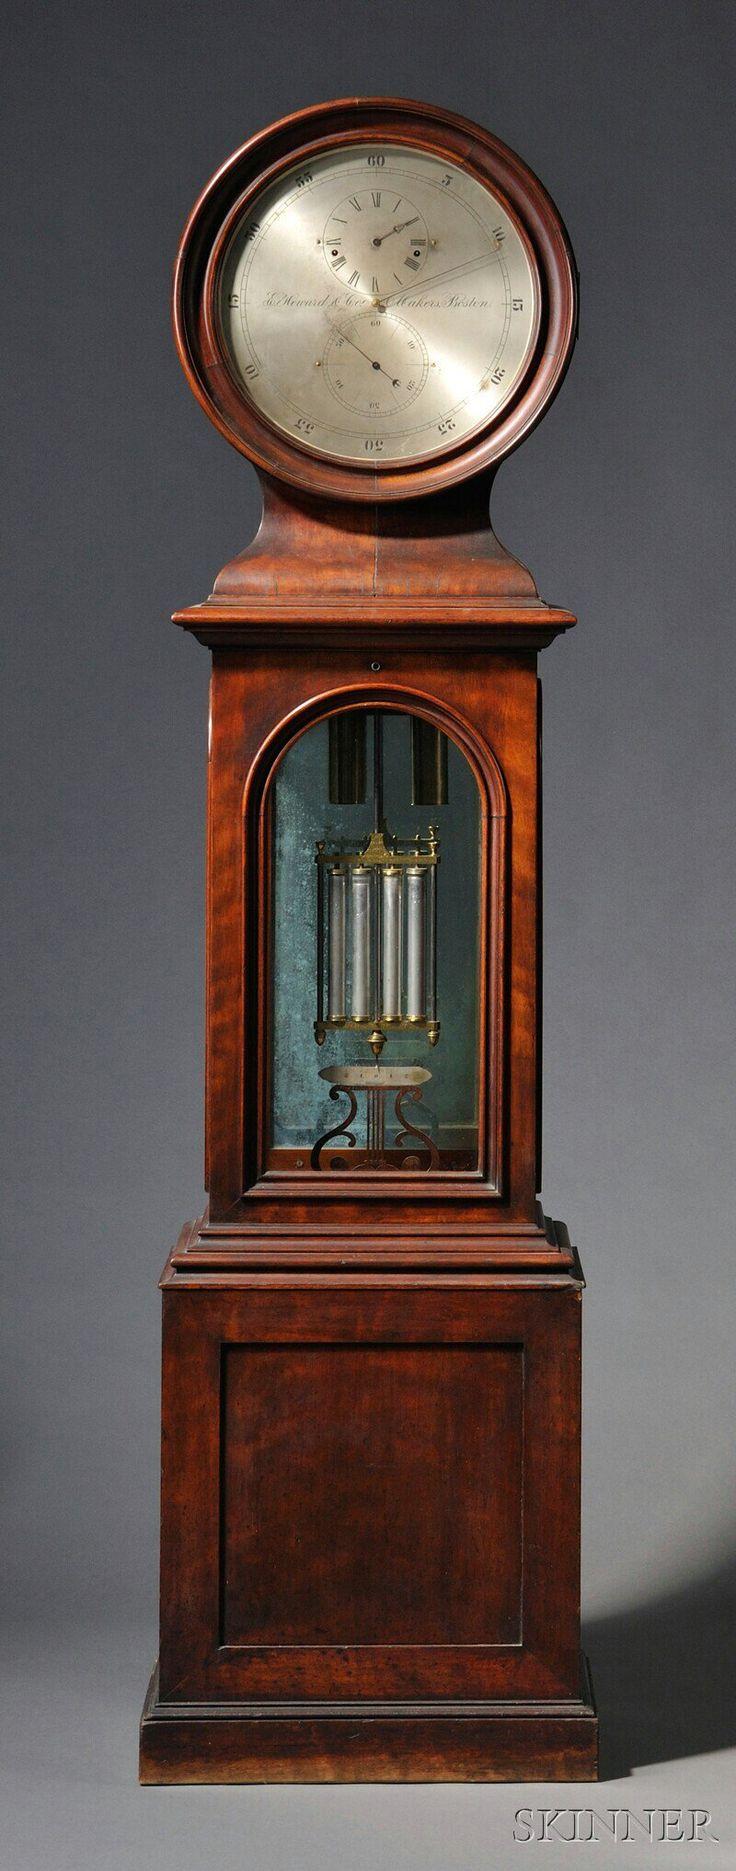 1000 Images About Amazing Clocks On Pinterest Auction